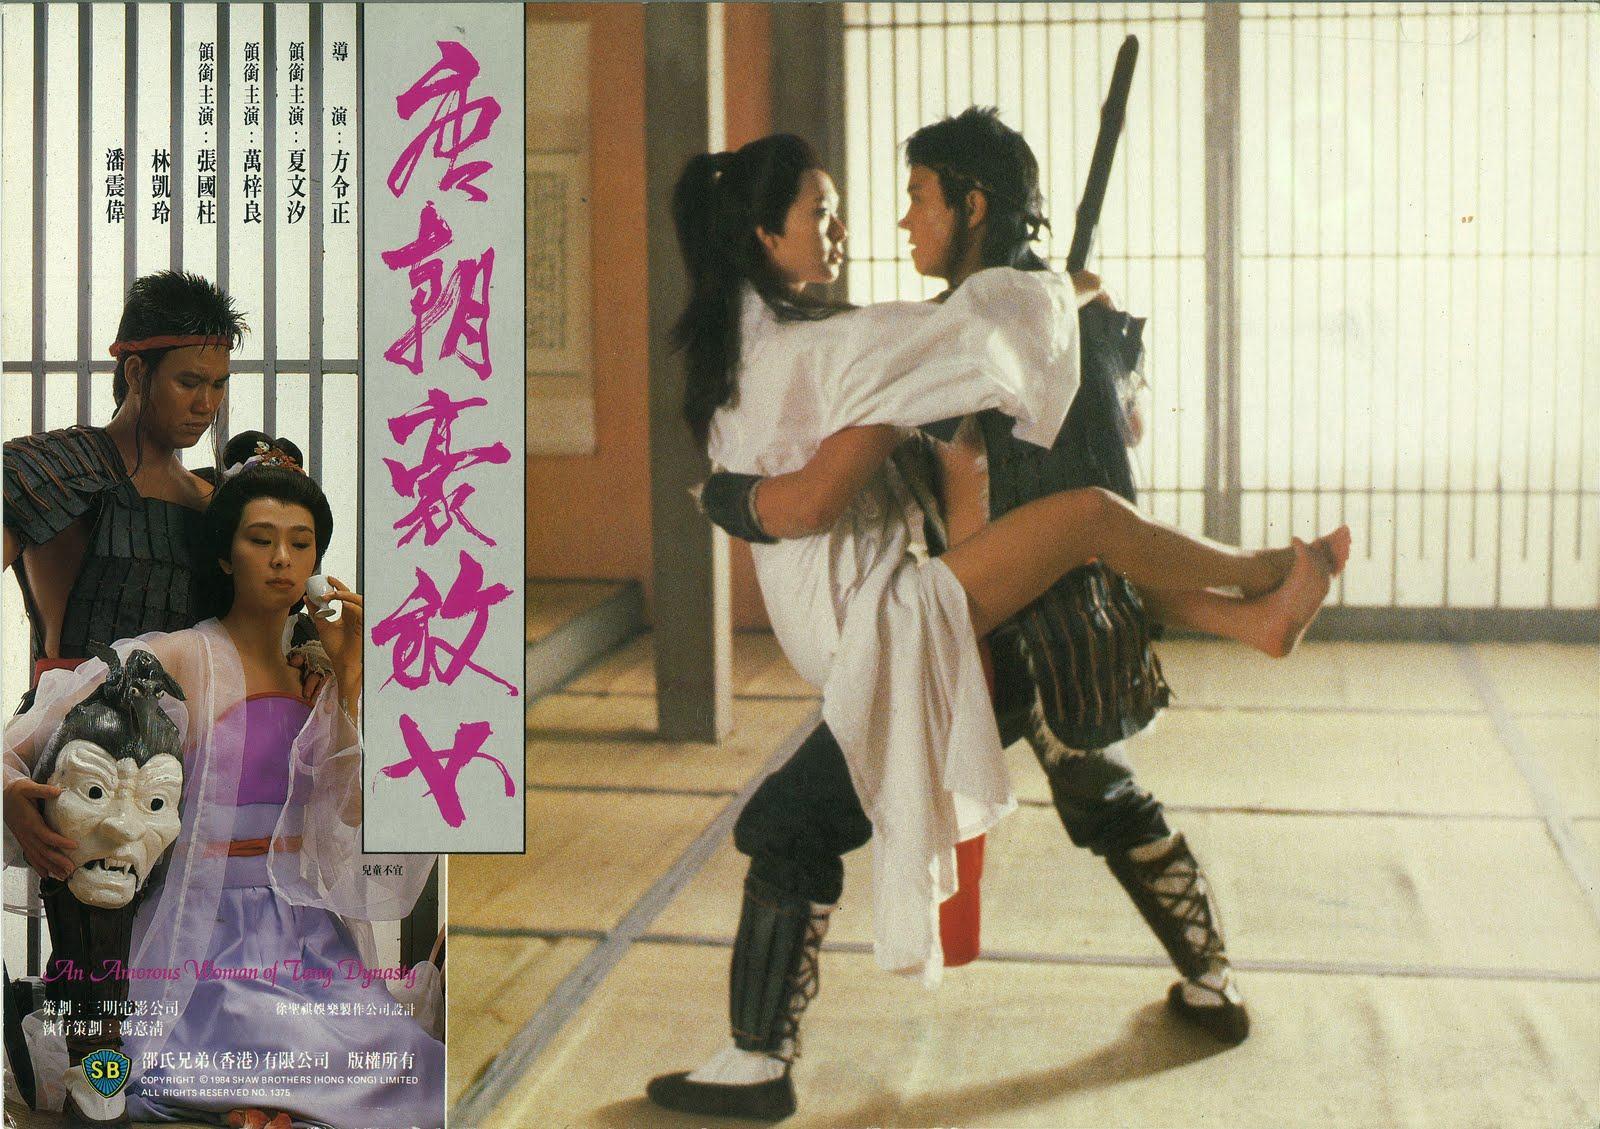 An Amorous Woman of Tang Dynasty - Đại Đường Mỹ Nữ (1984) DVD9 an amorous woman of tang dynasty An Amorous Woman of Tang Dynasty – Đại Đường Mỹ Nữ (1984) DVD9 an amourous woman of tang dynasty 1986 duong trieu hao phong nu crackman